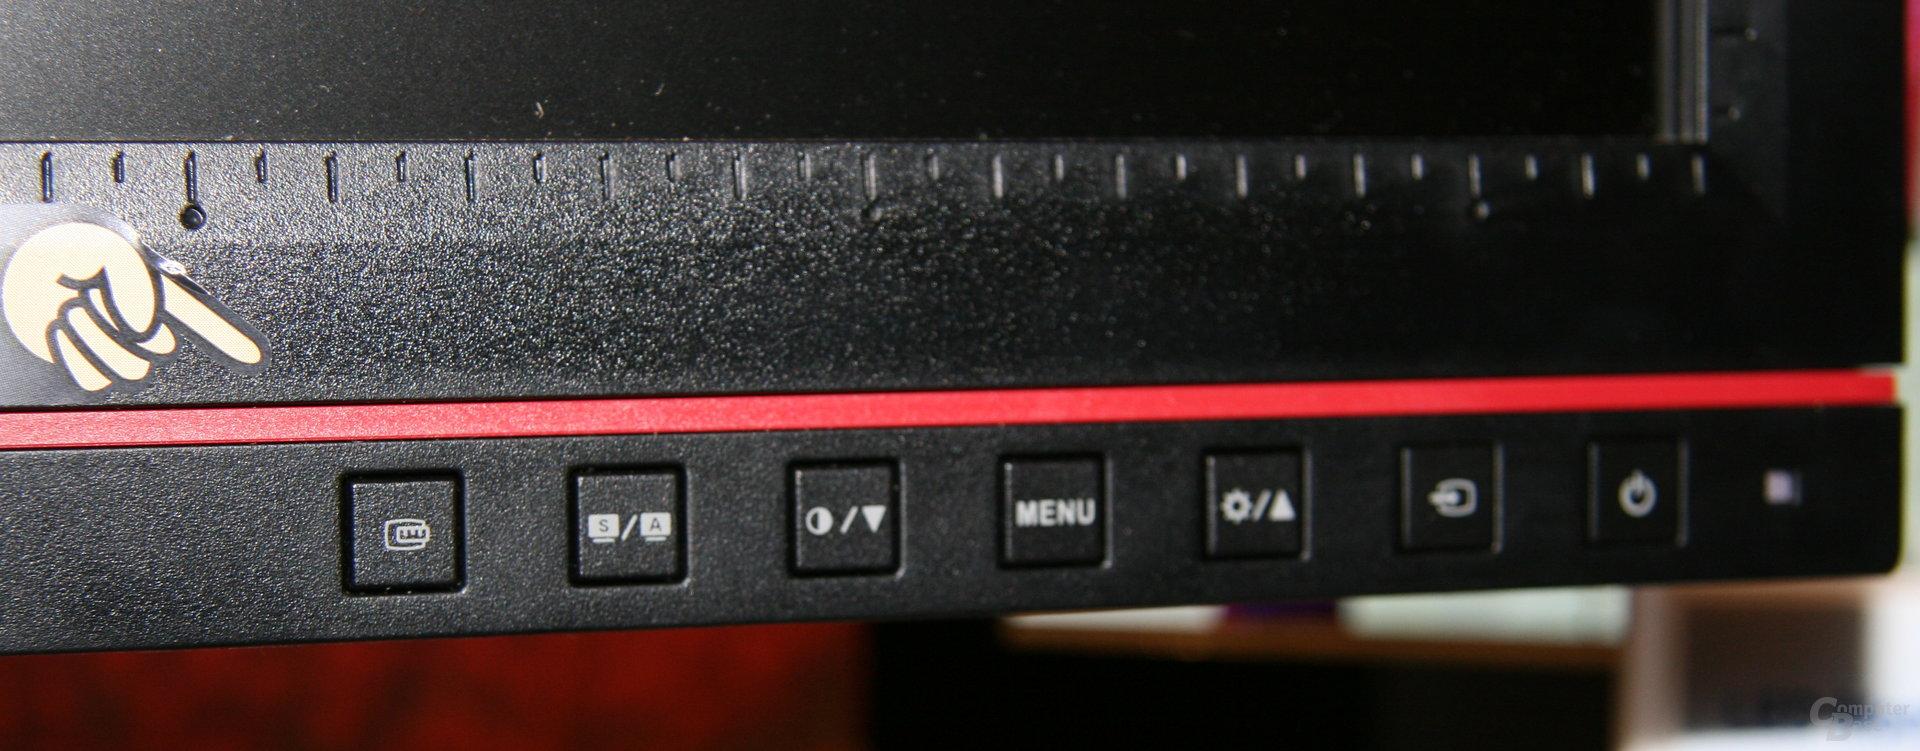 Asus PA246Q